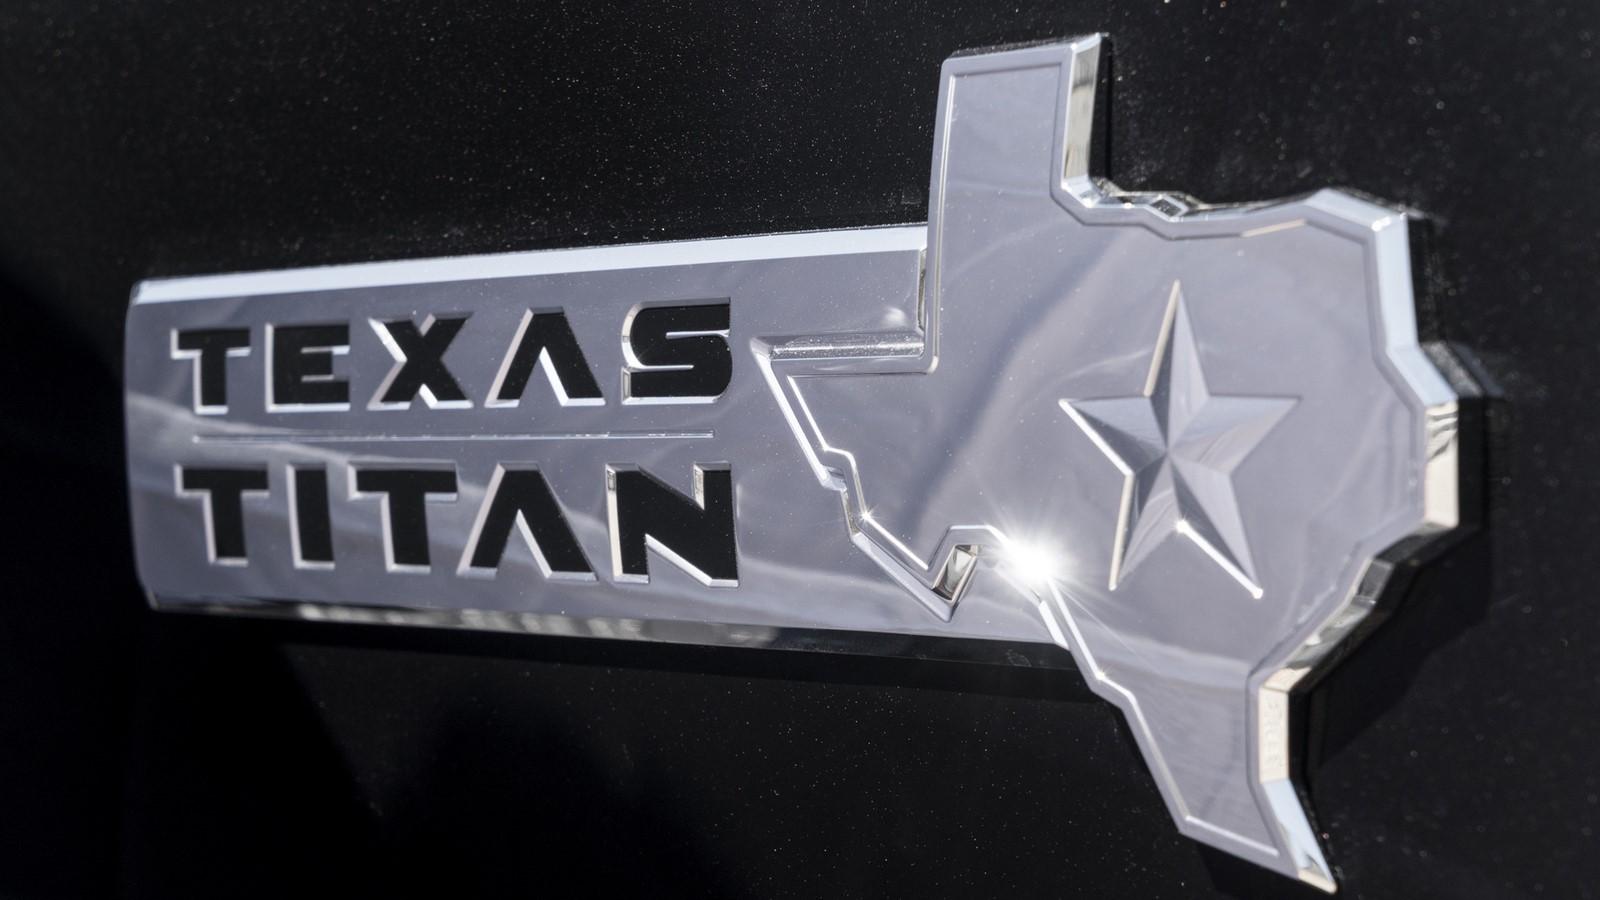 Nissan Texas Titan Edition 2017 Autoblog Gr